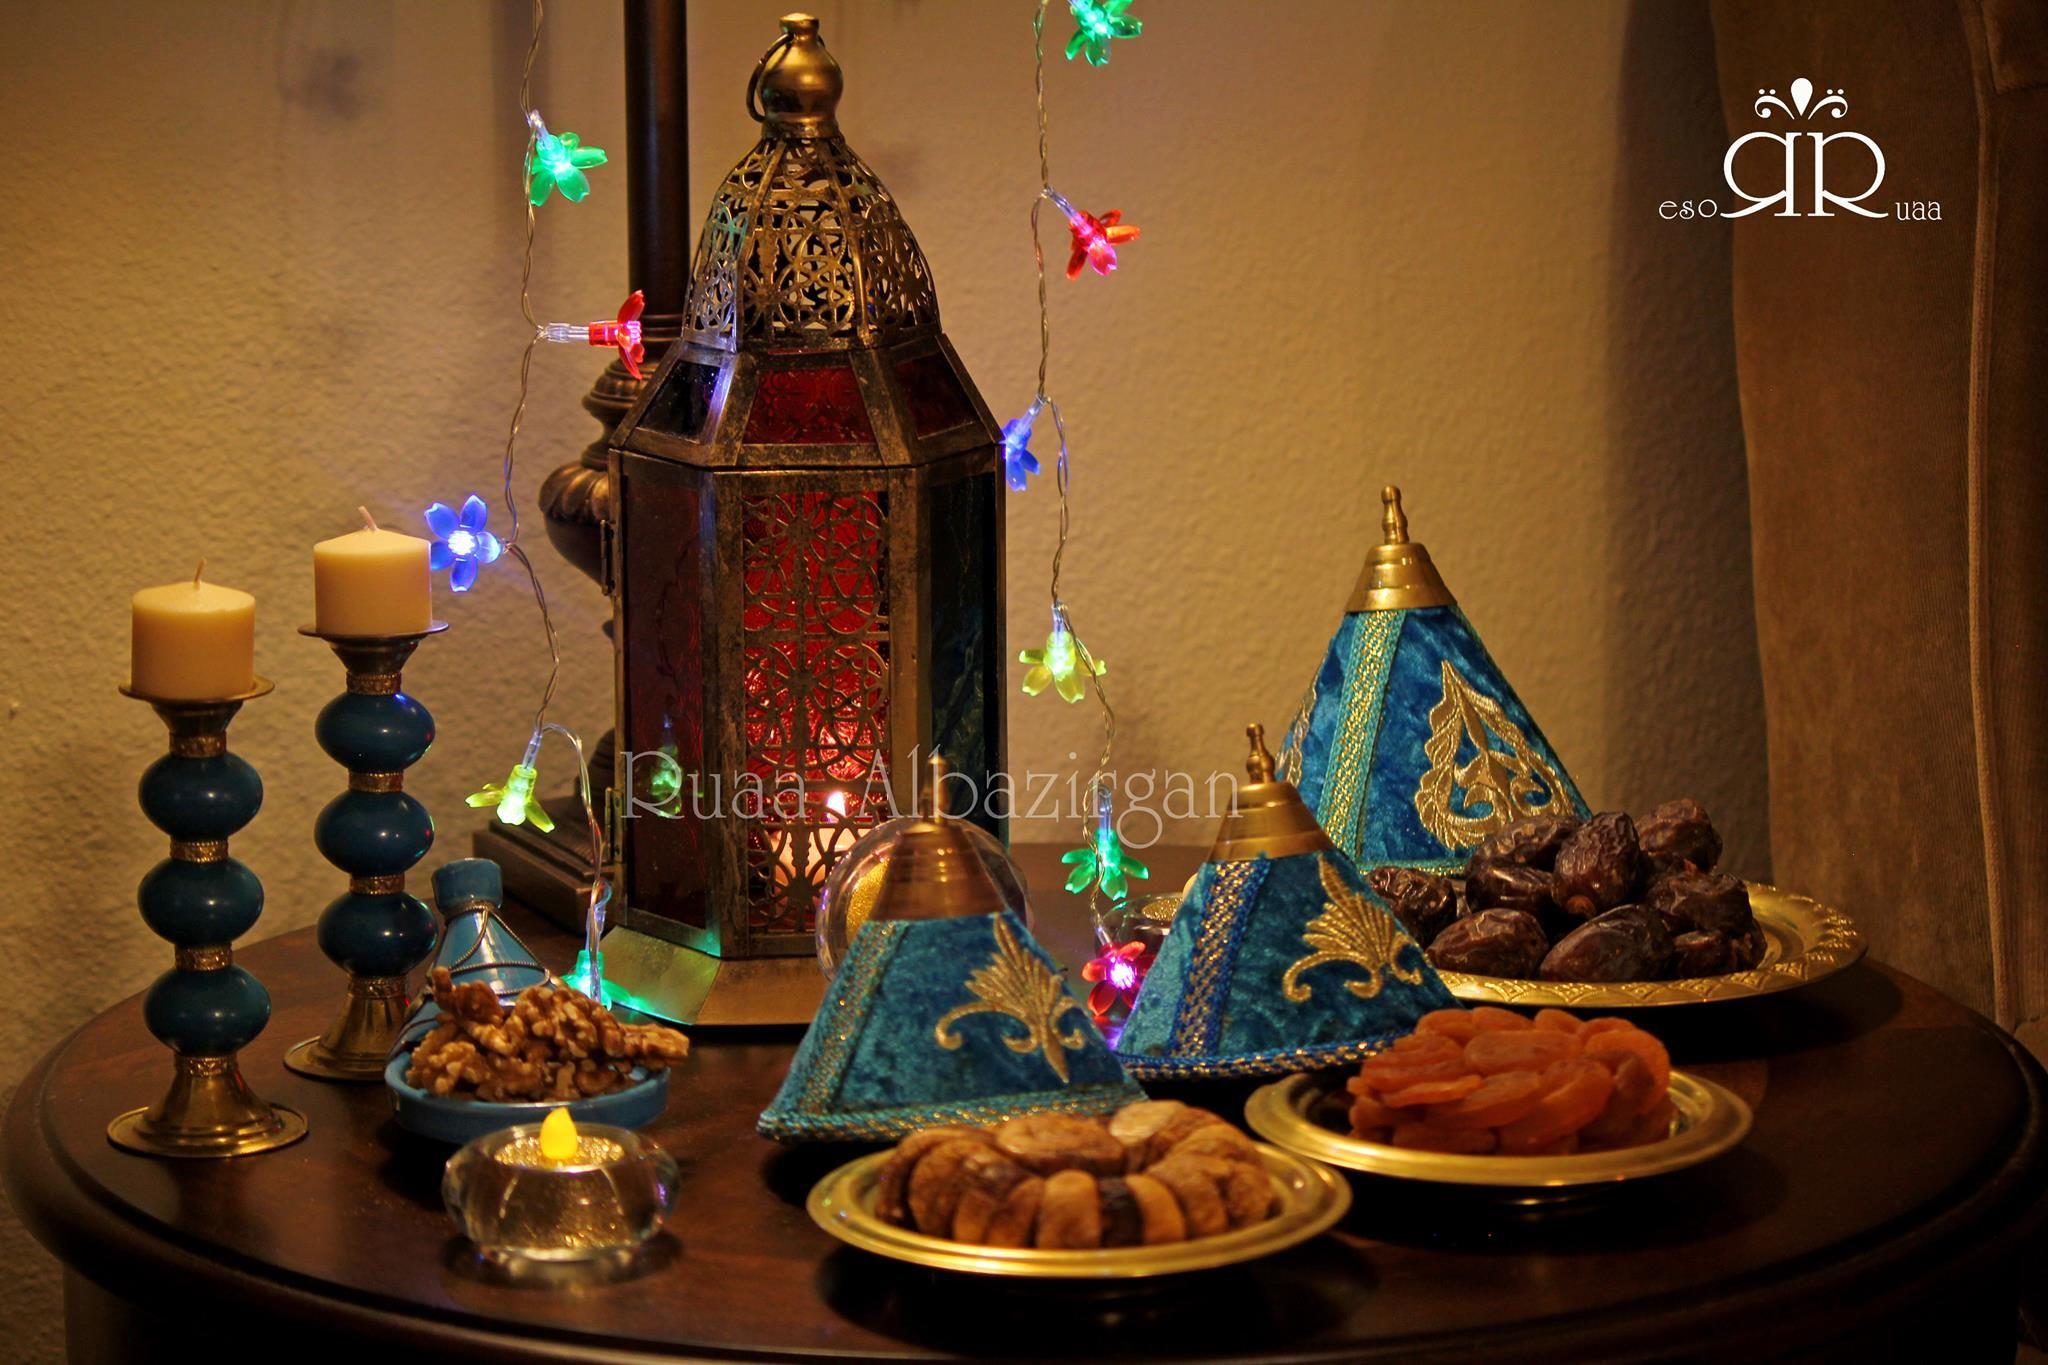 Ramadan By Ruaa Rose رمضان كريم Ramadan Decorations Ramadan Crafts Ramzan Eid